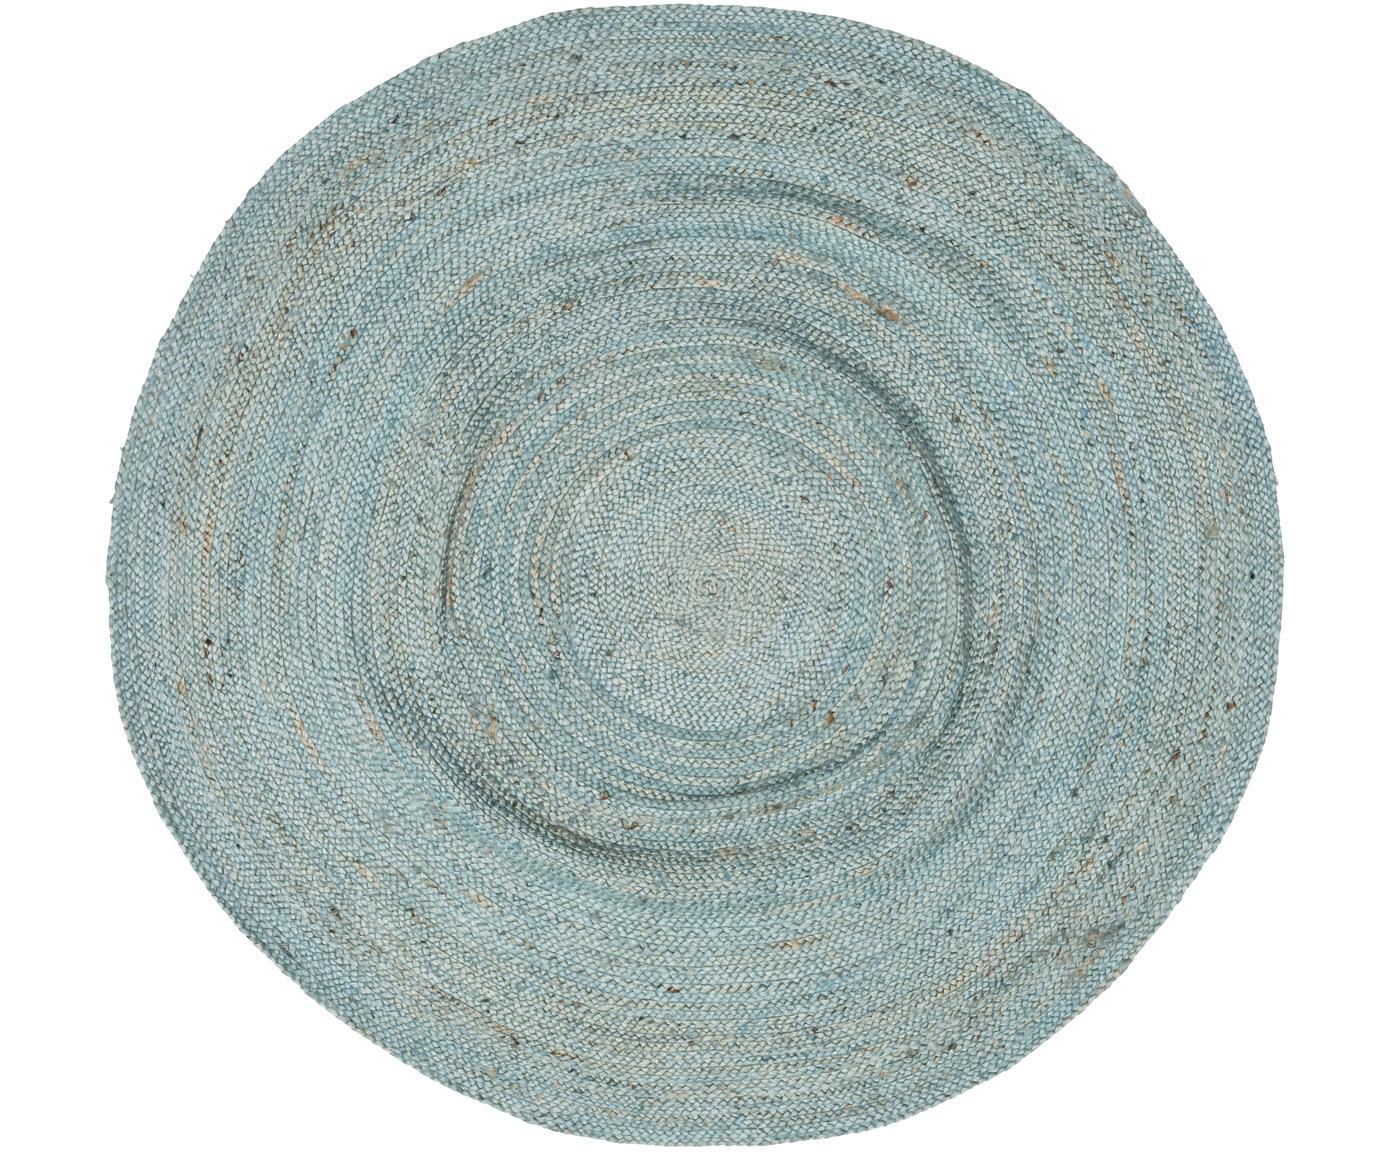 Tappeto rotondo in juta azzurro Pampas, Juta, Azzurro, Ø 150 cm (taglia M)